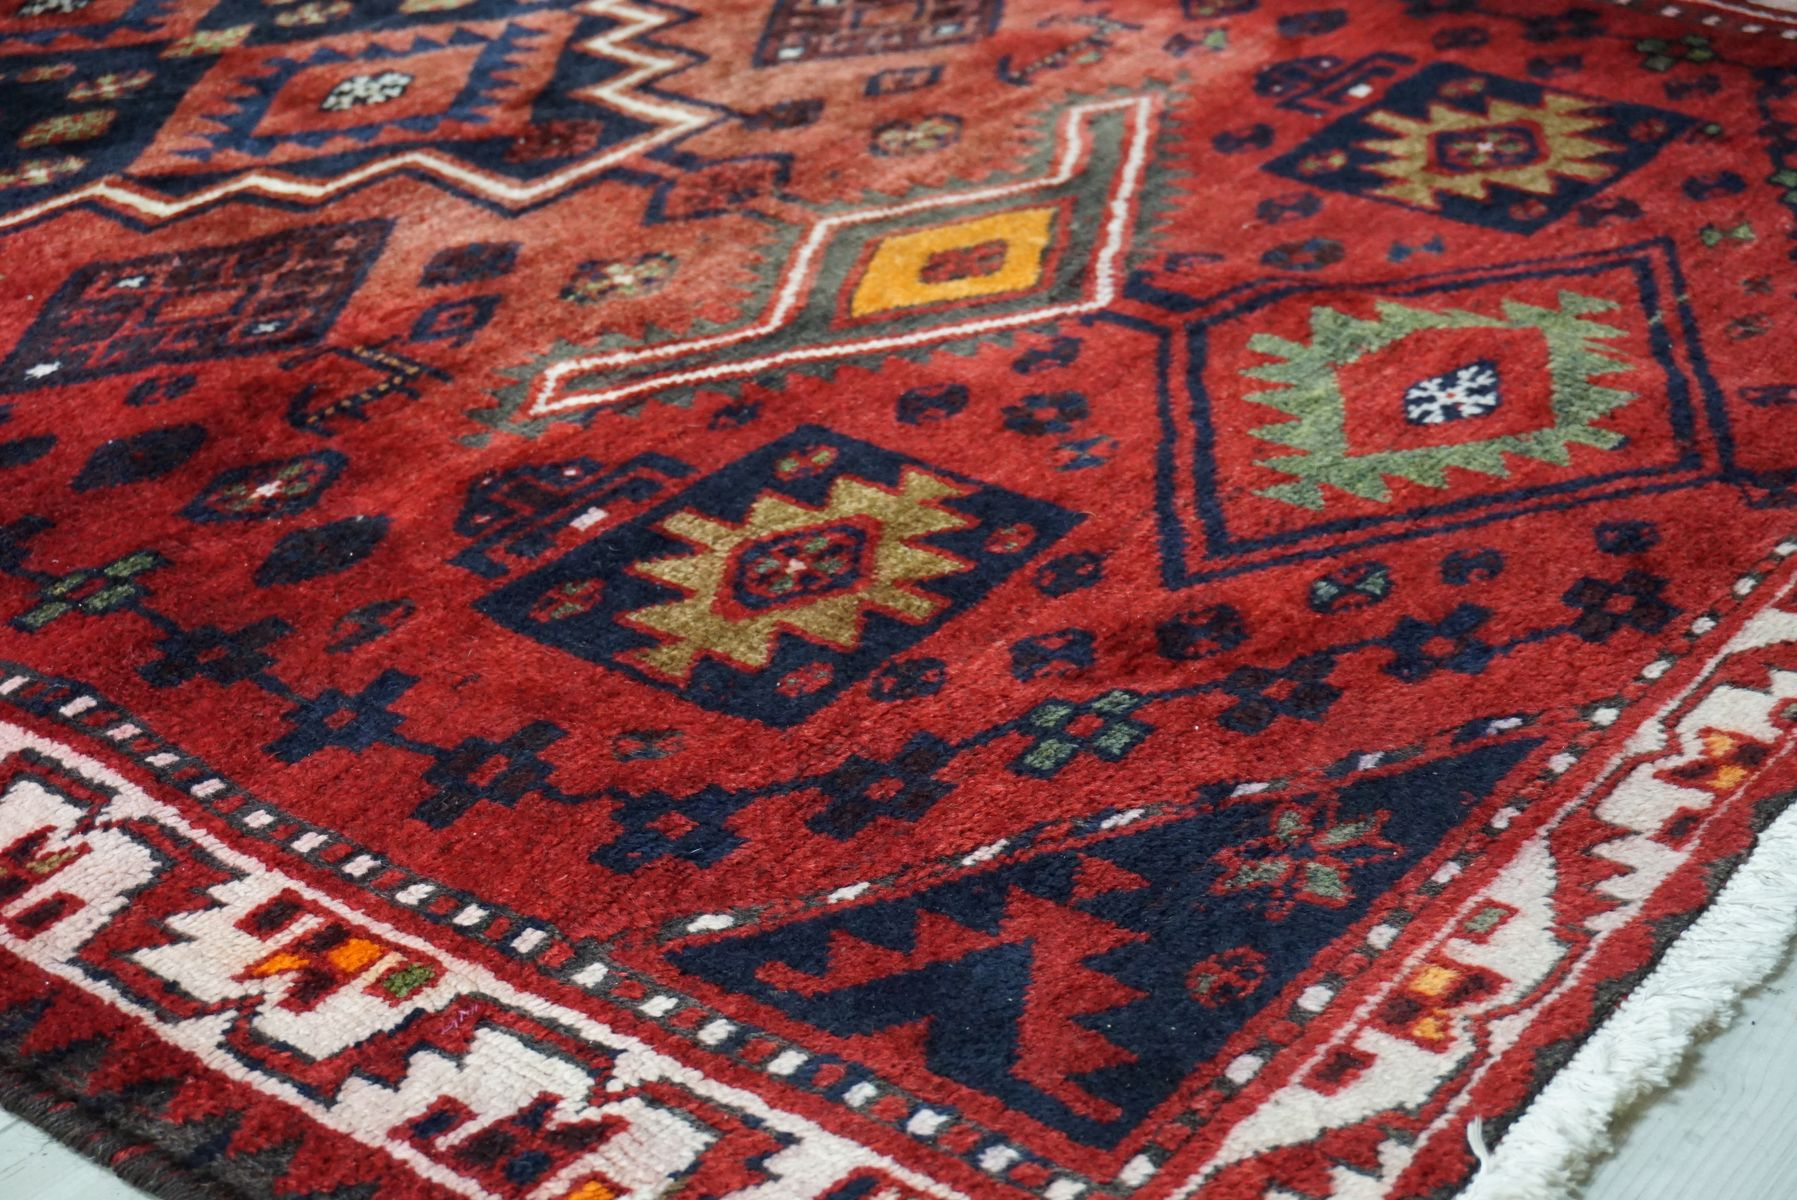 tapis fait la main iran 1980s en vente sur pamono. Black Bedroom Furniture Sets. Home Design Ideas